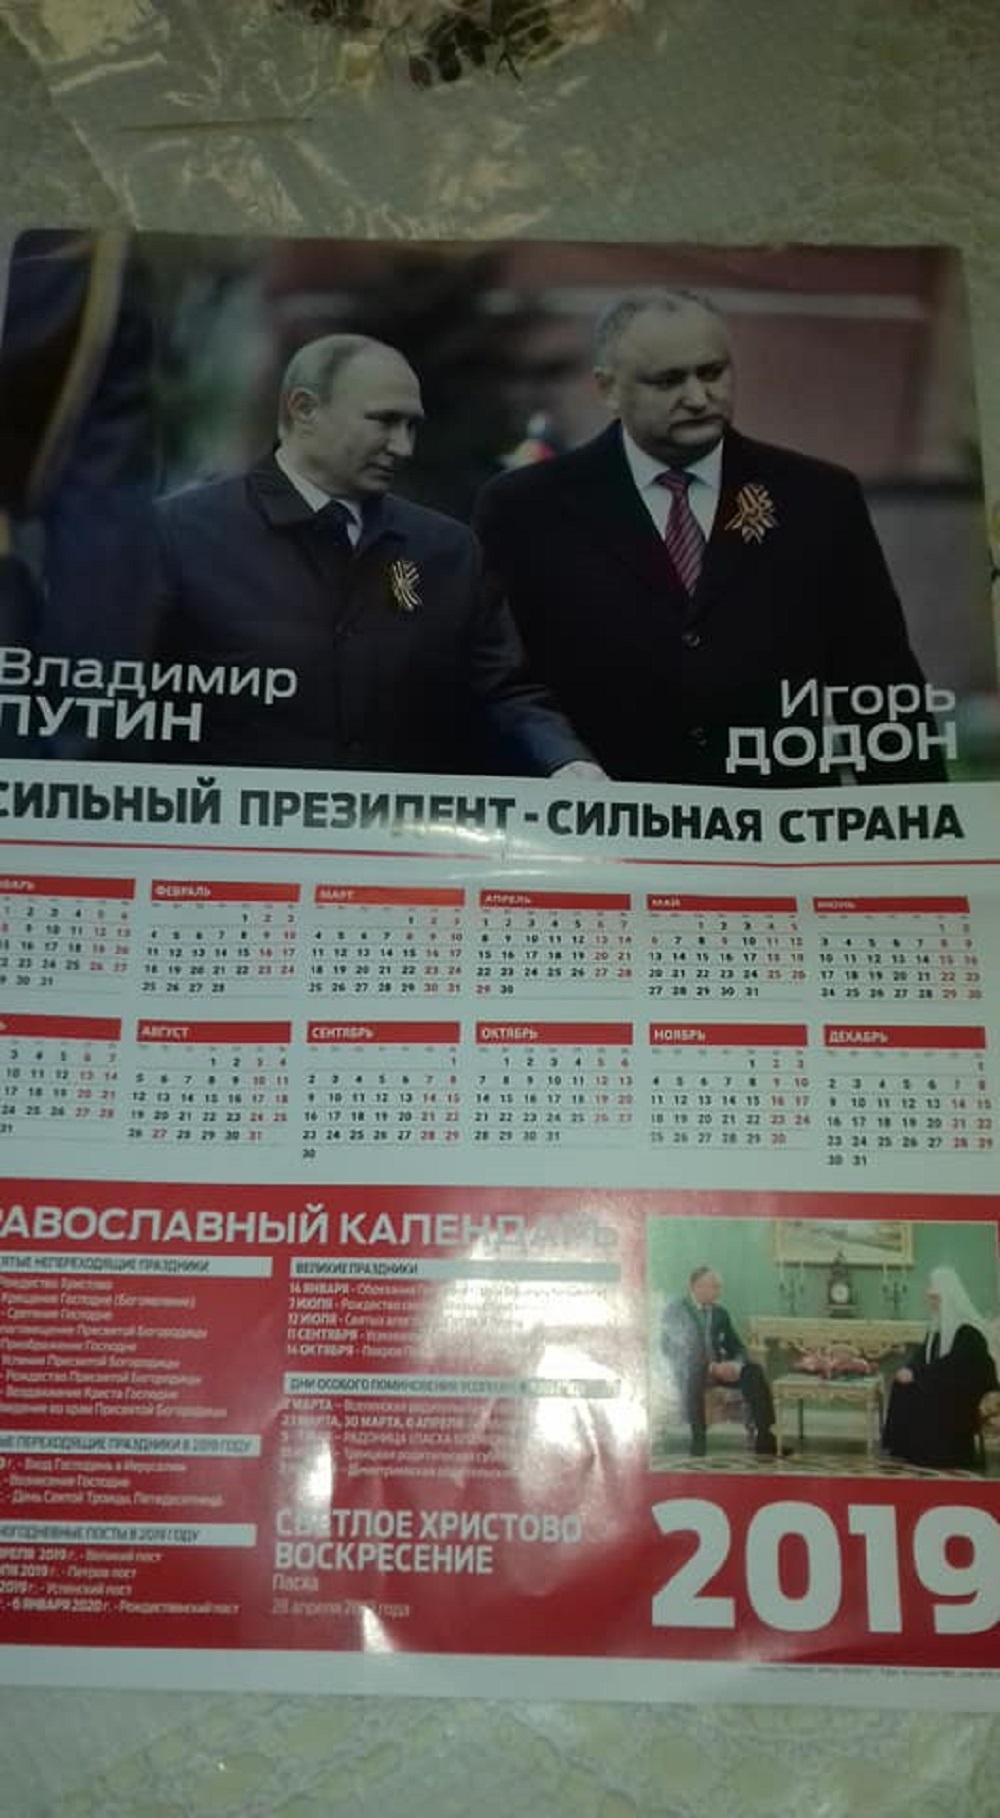 calendar Dodon